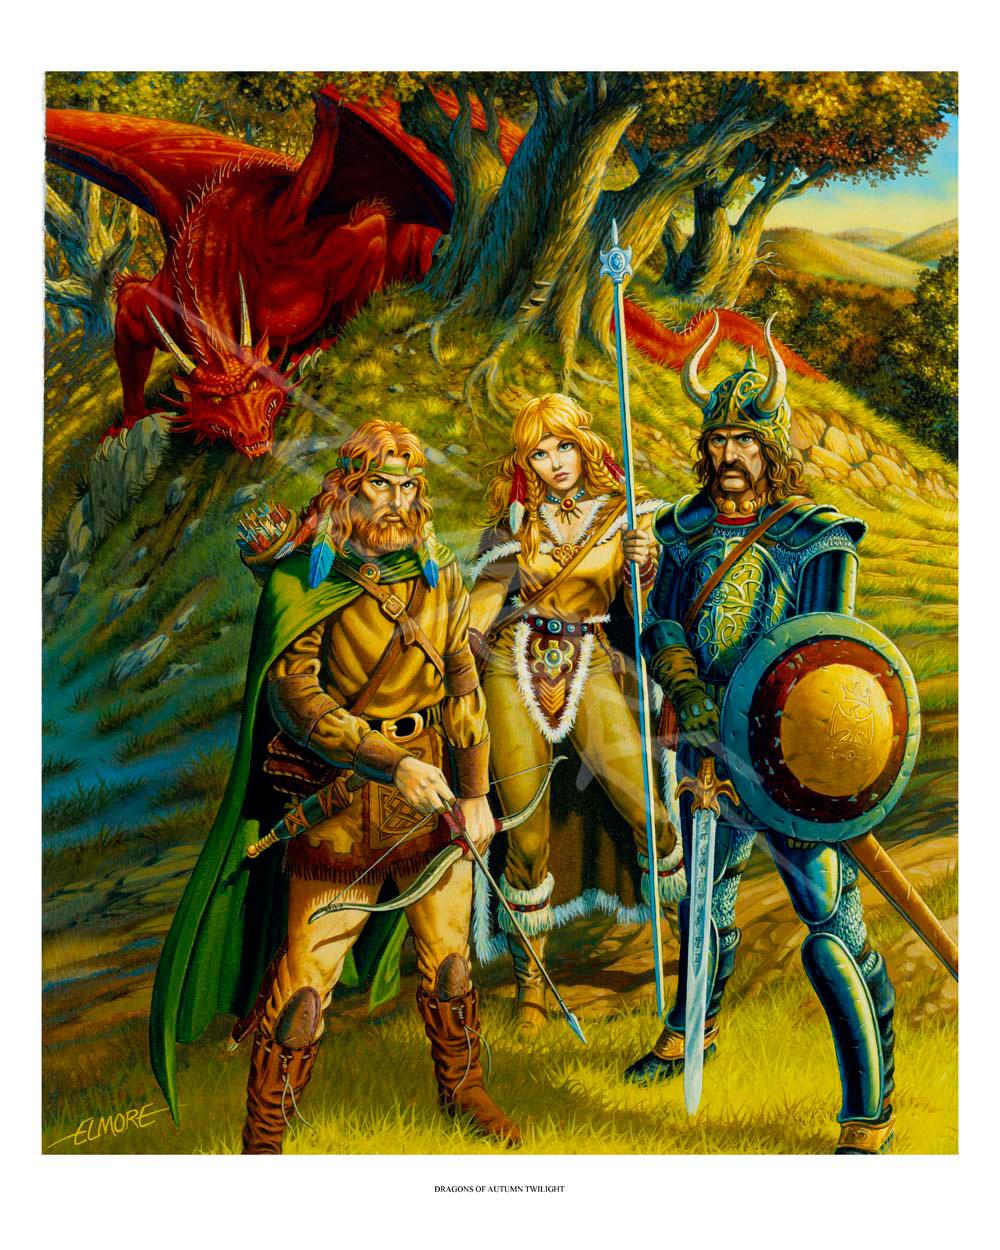 DRAGONLANCE-Dragons-of-Autumn-Twilight.jpg